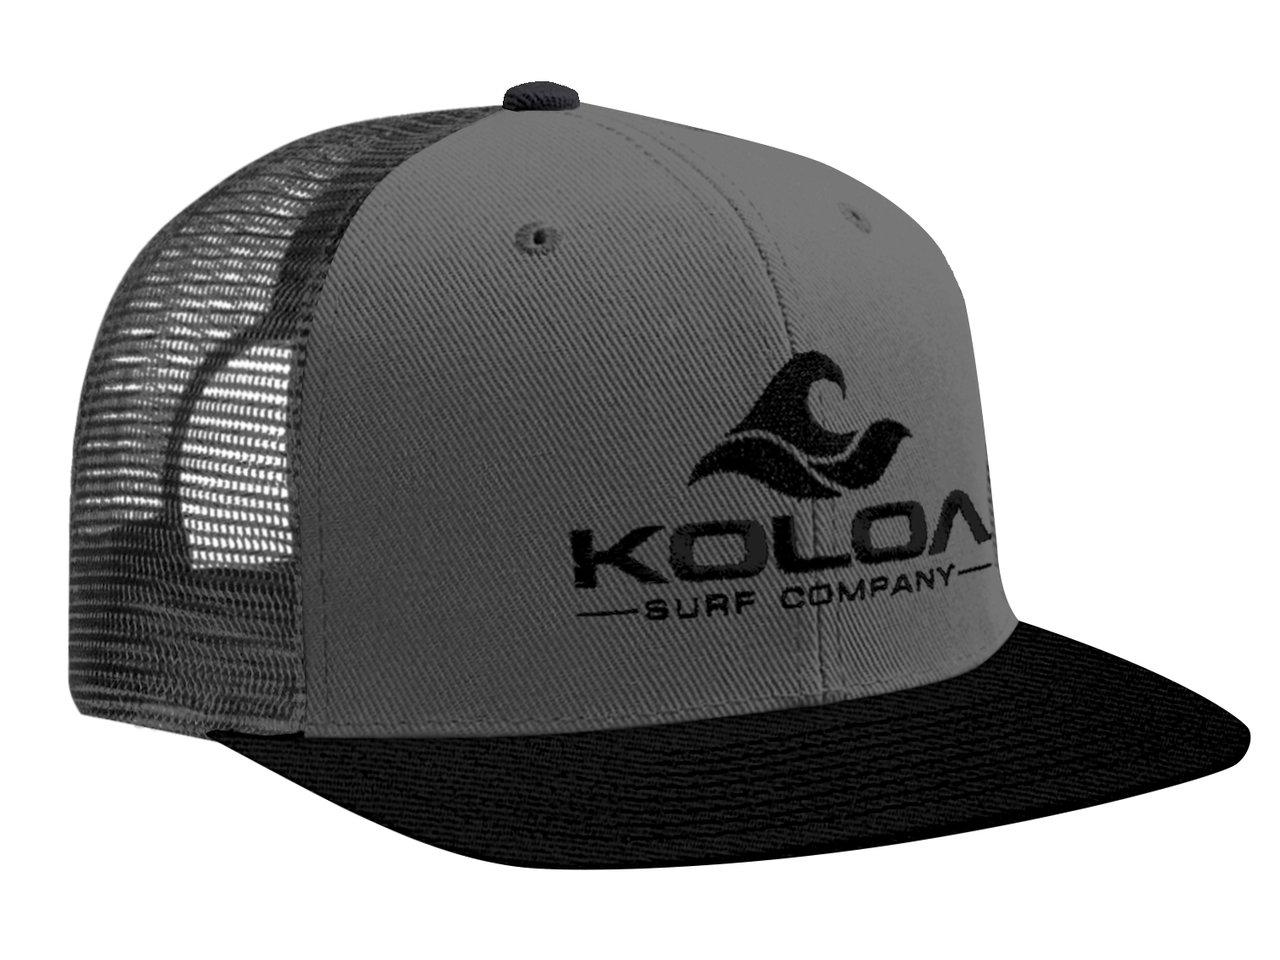 Koloa Surf(tm) Mesh Back Wave Logo Trucker Hat Black/Grey with Black Logo